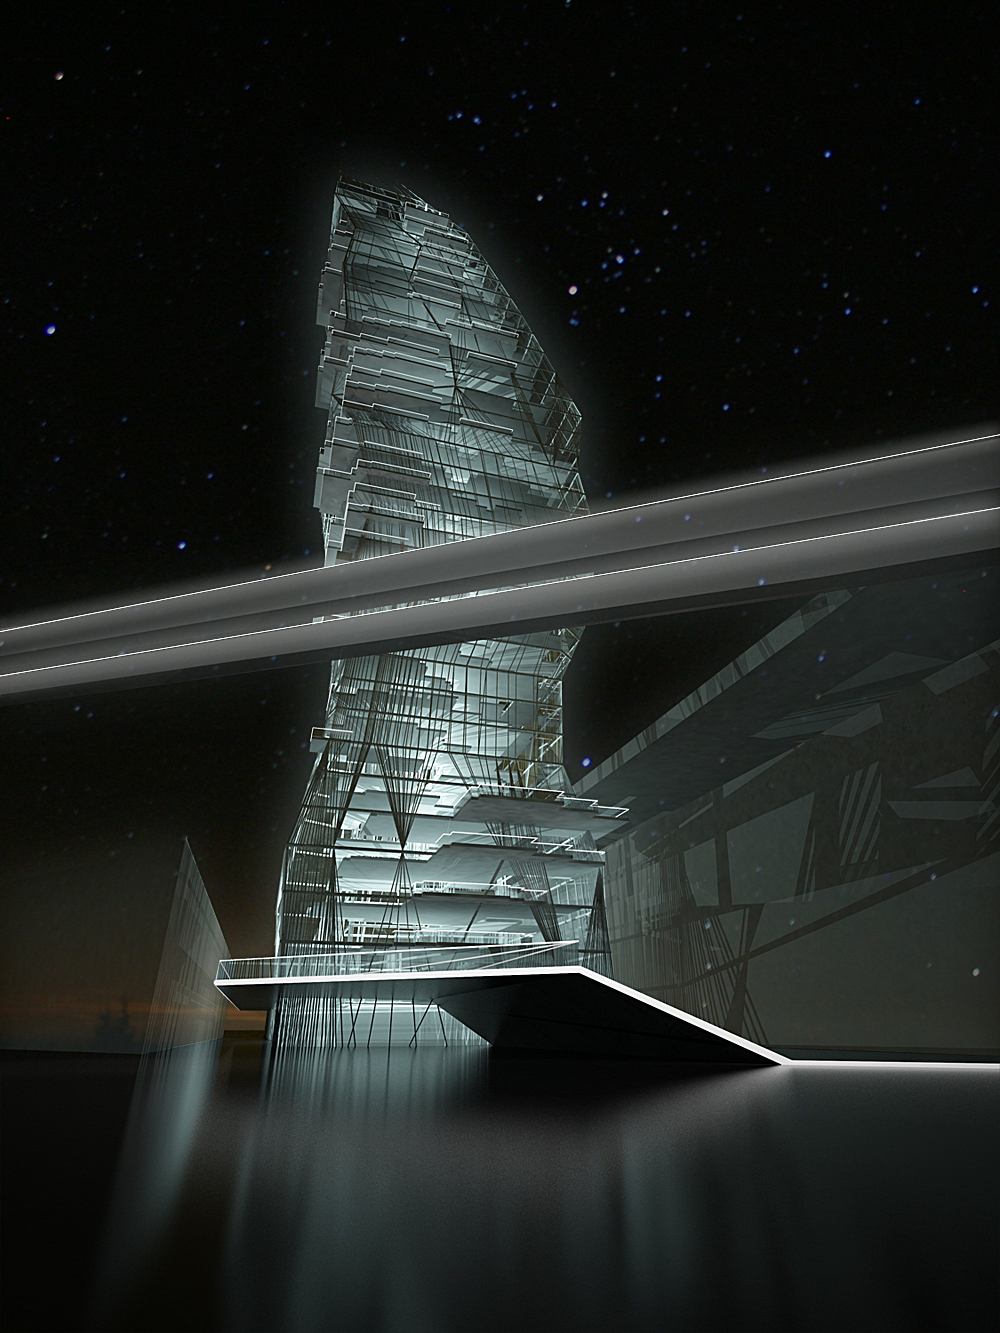 Full Tower, At Night